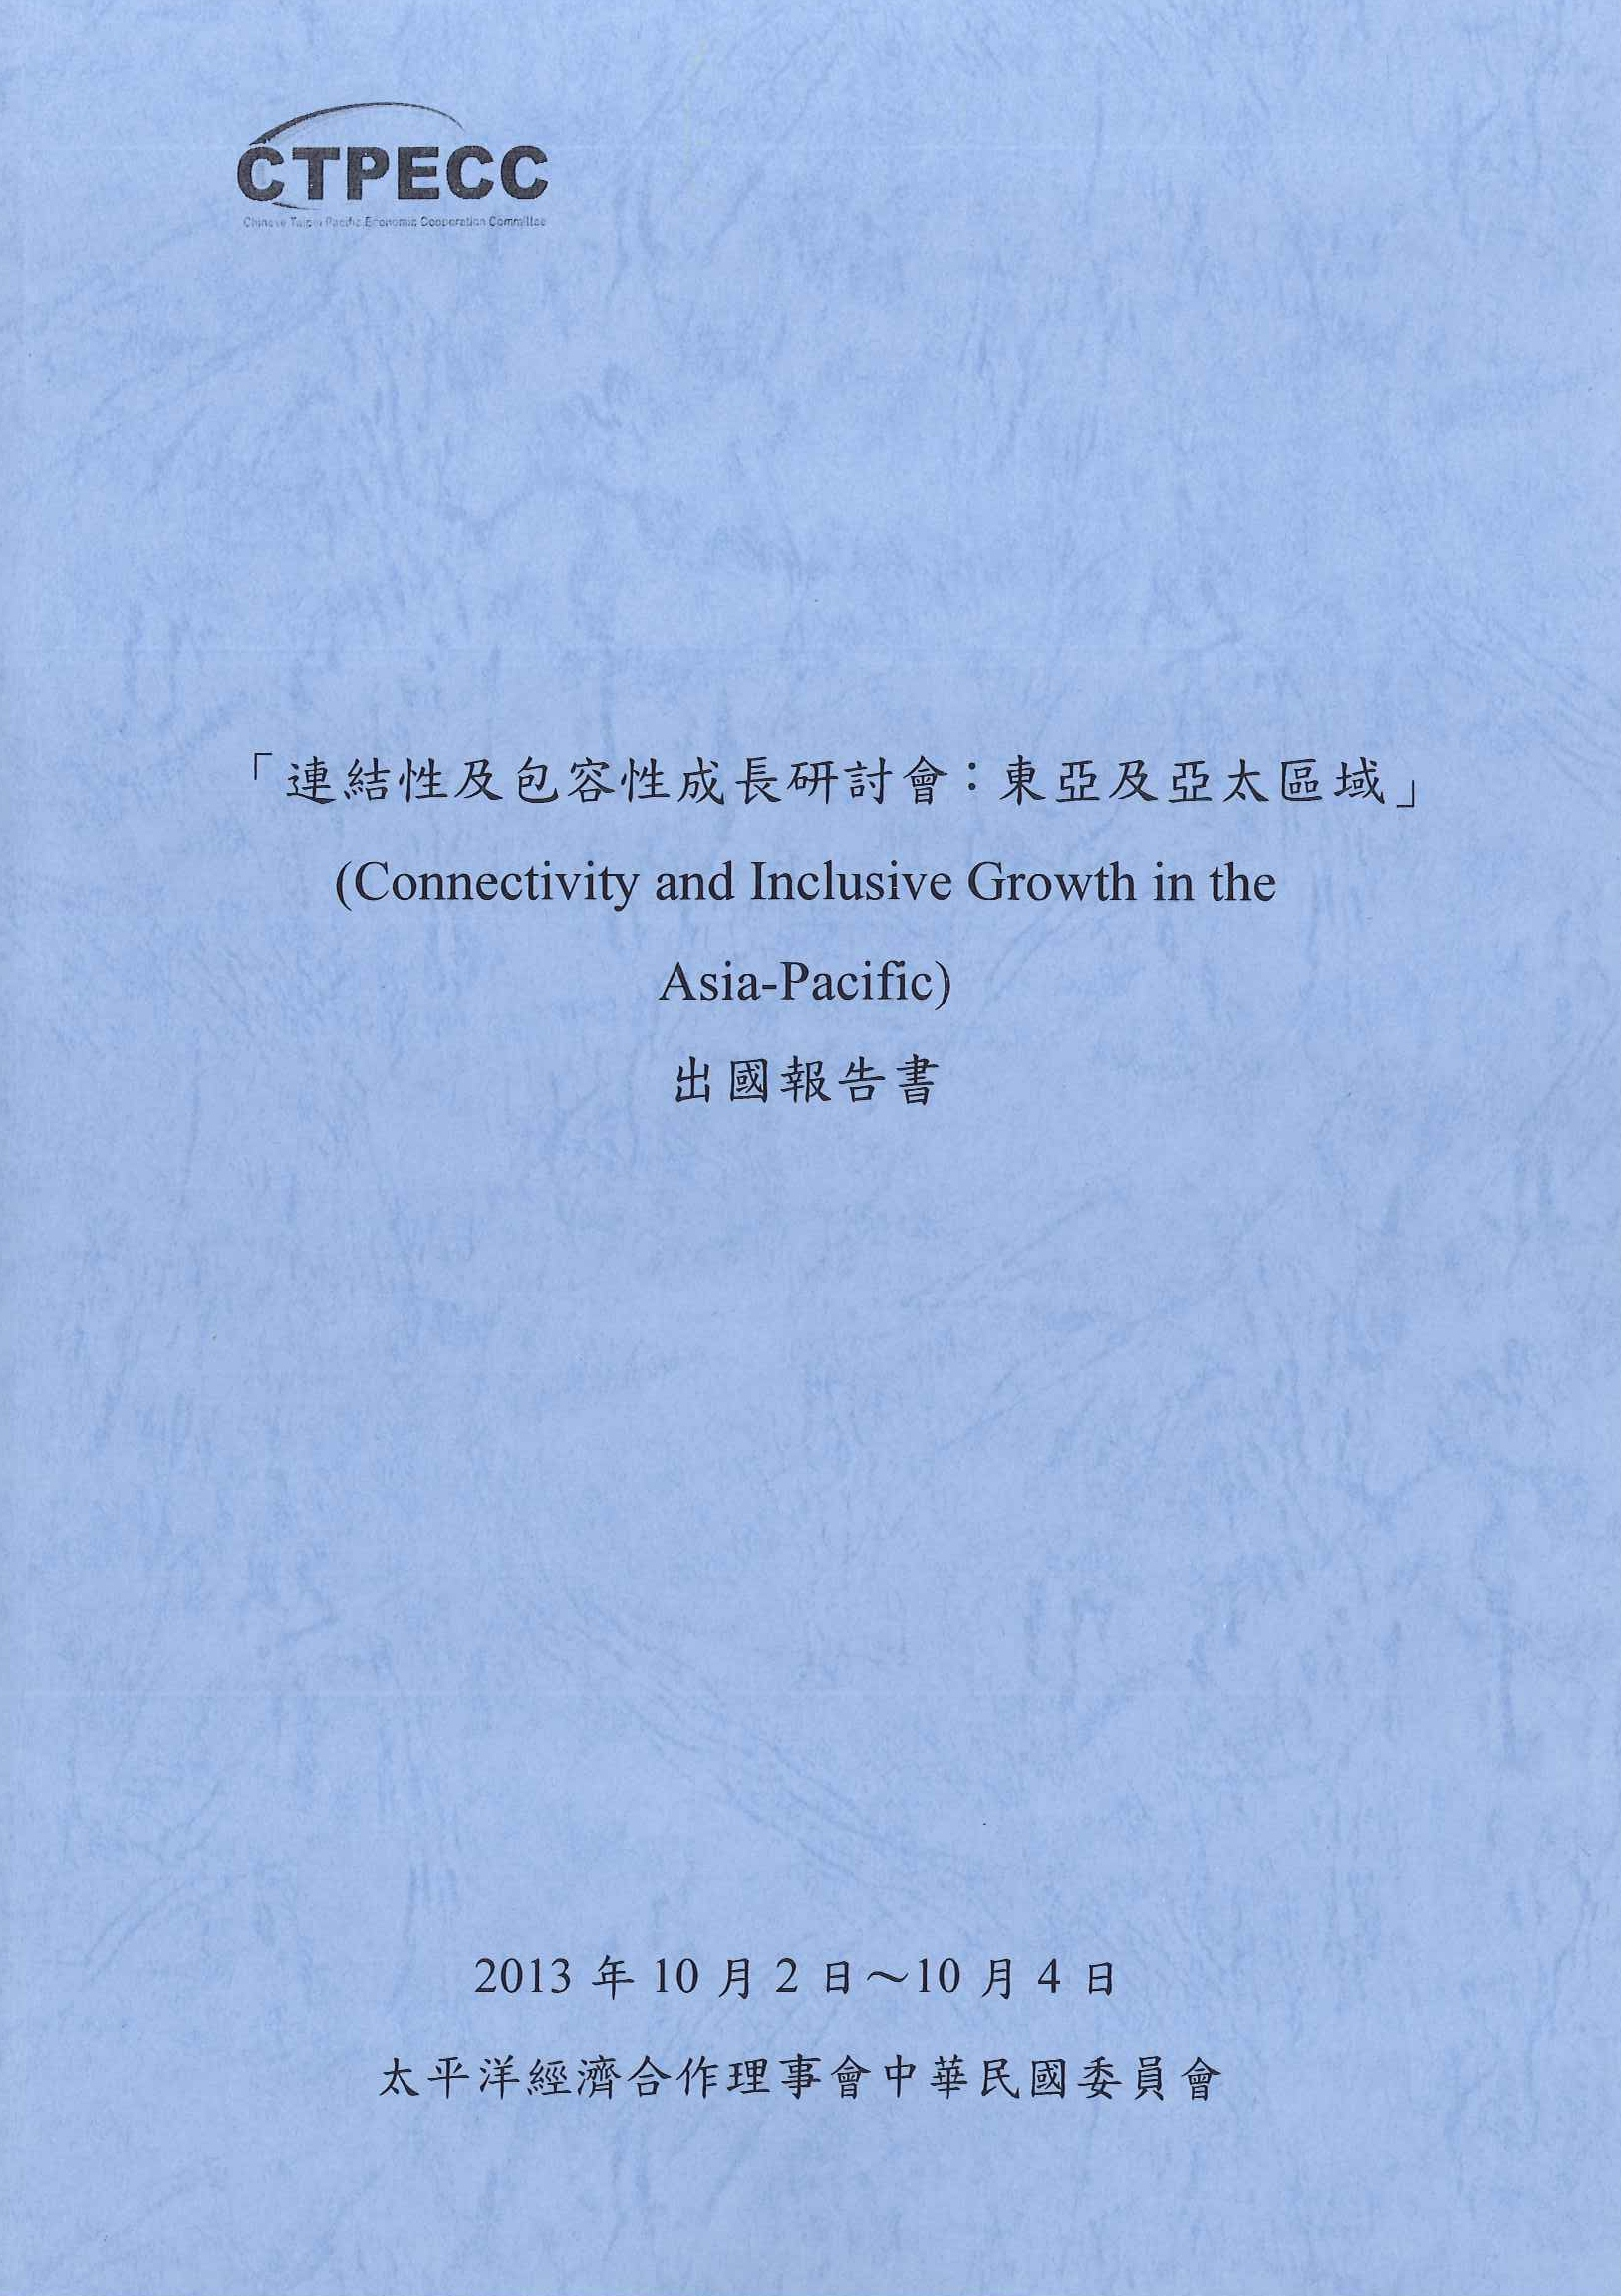 「連結性及包容性成長研討會:東亞及亞太地區」出國報告書=Connectivity and inclusive growth in the Asia-Pacific